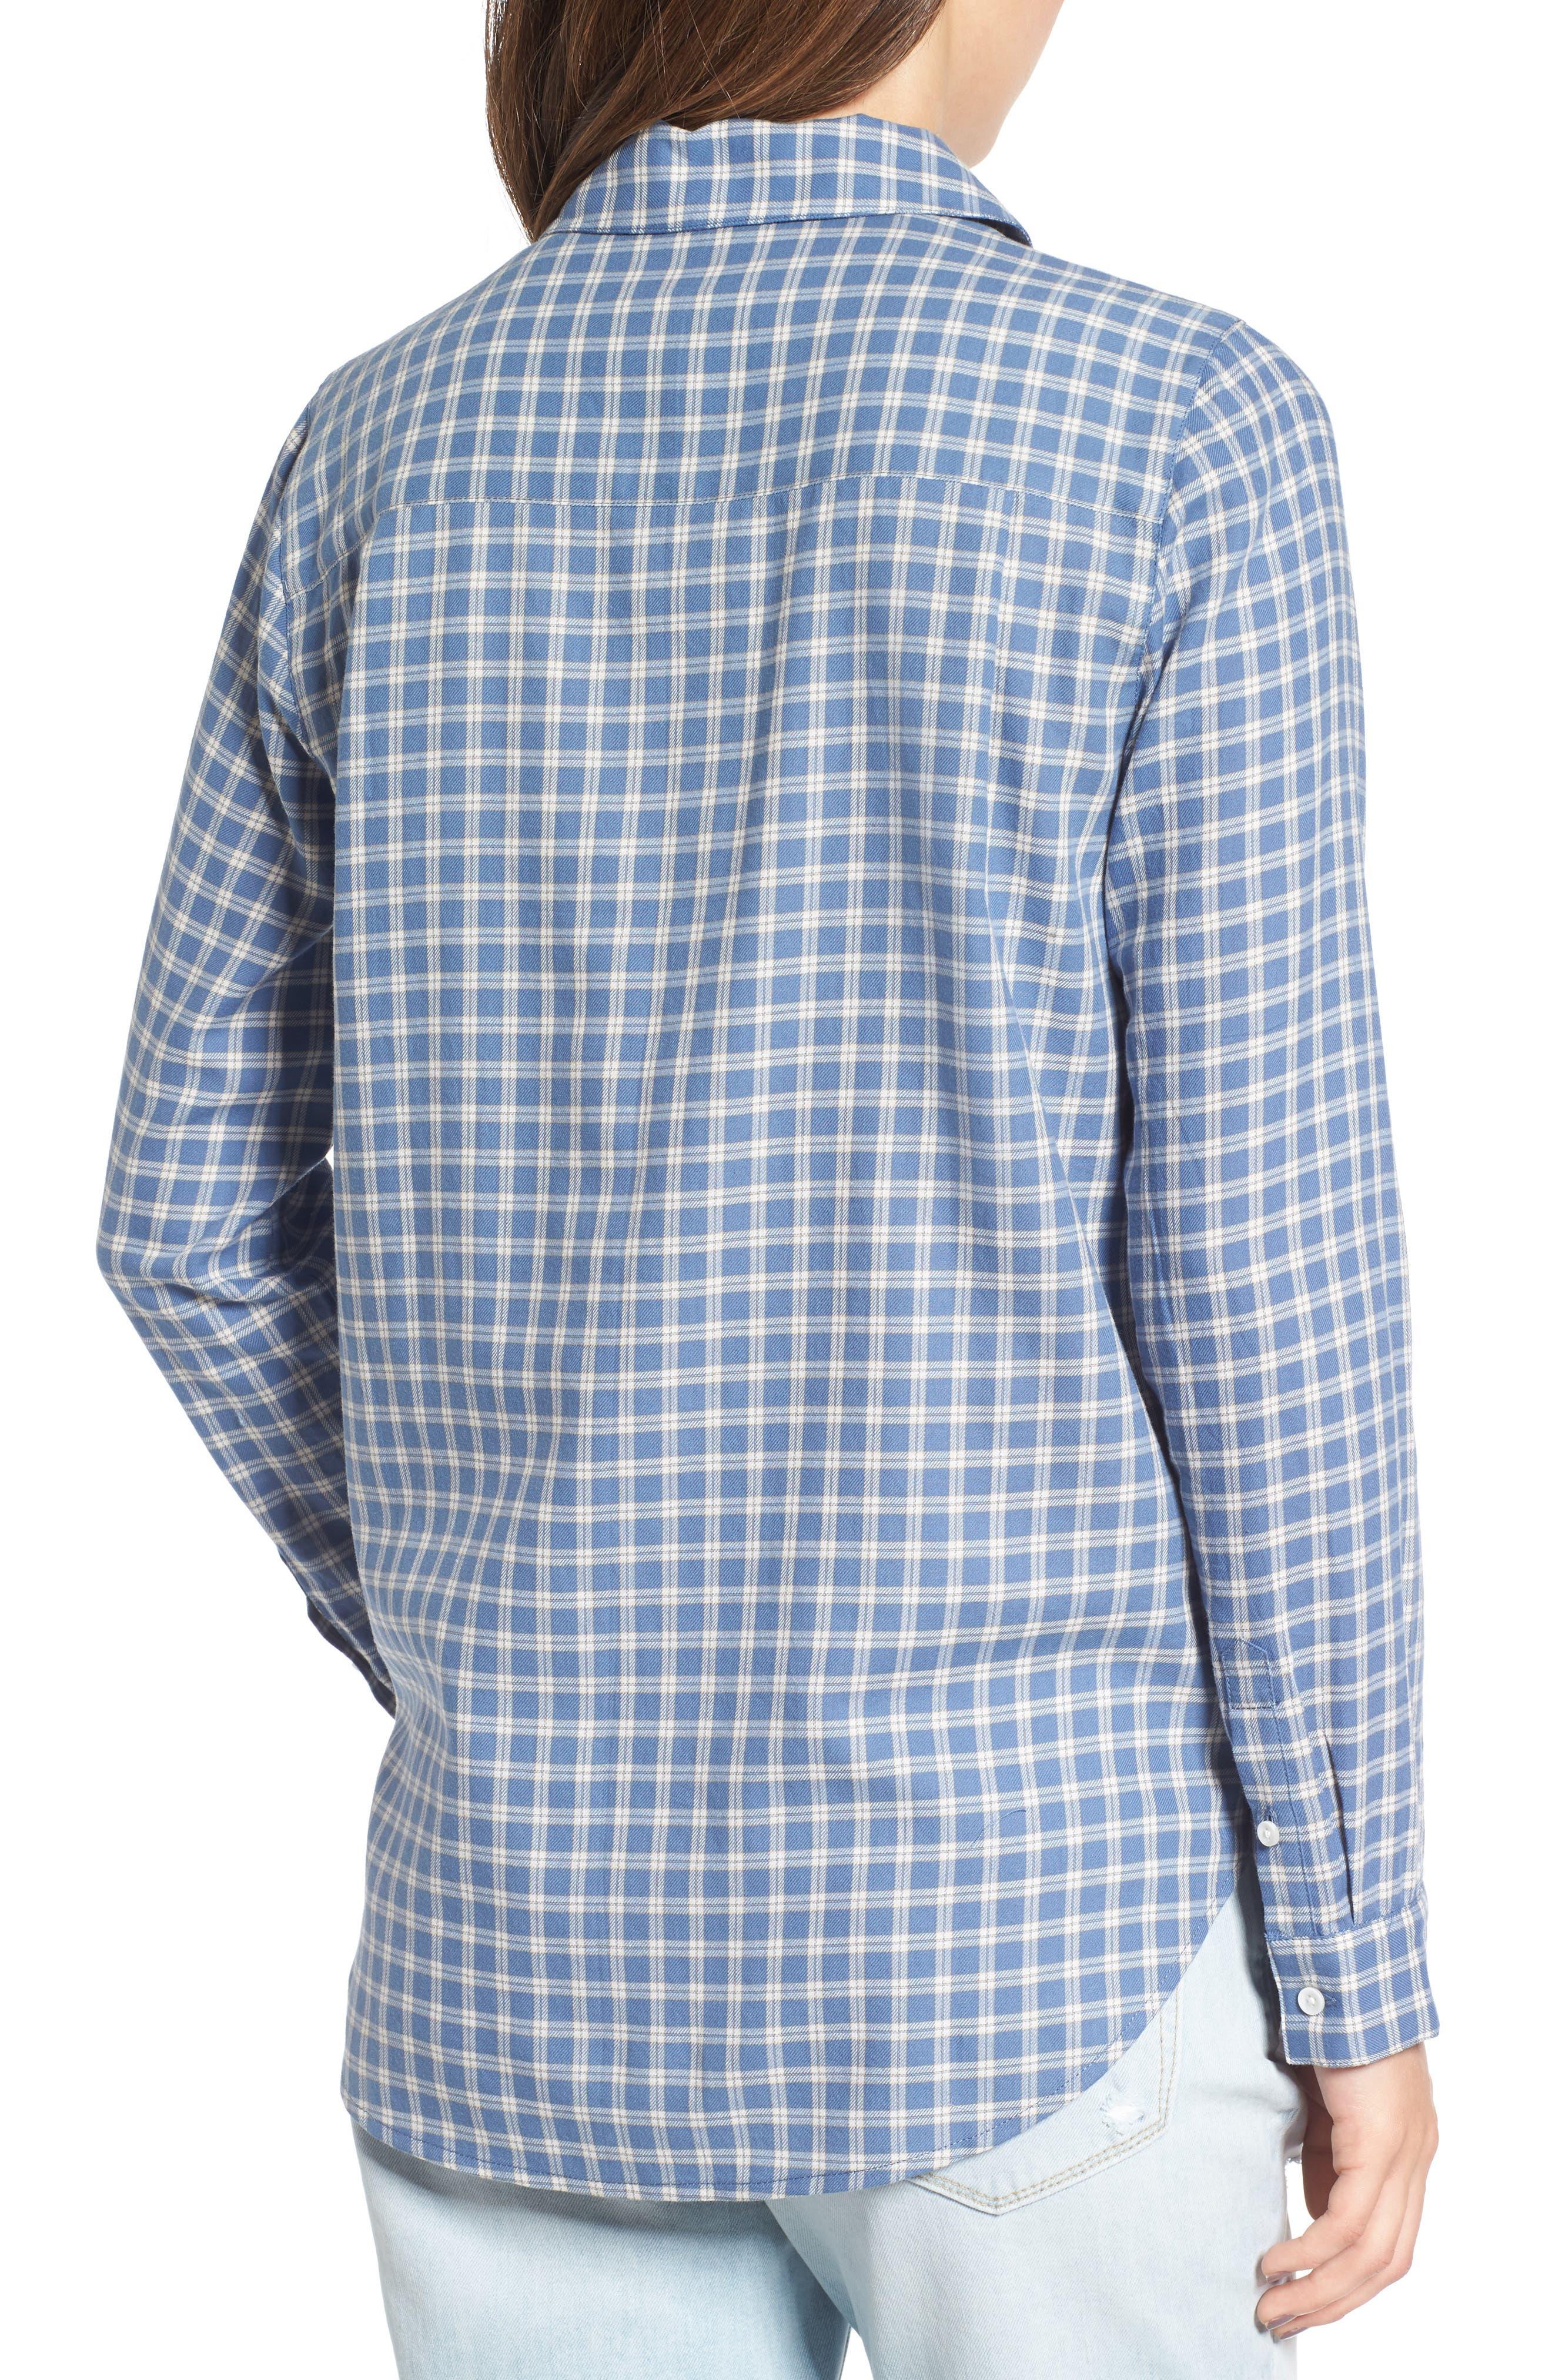 Classic Plaid Shirt,                             Alternate thumbnail 2, color,                             Blue Moonlight Grid Check